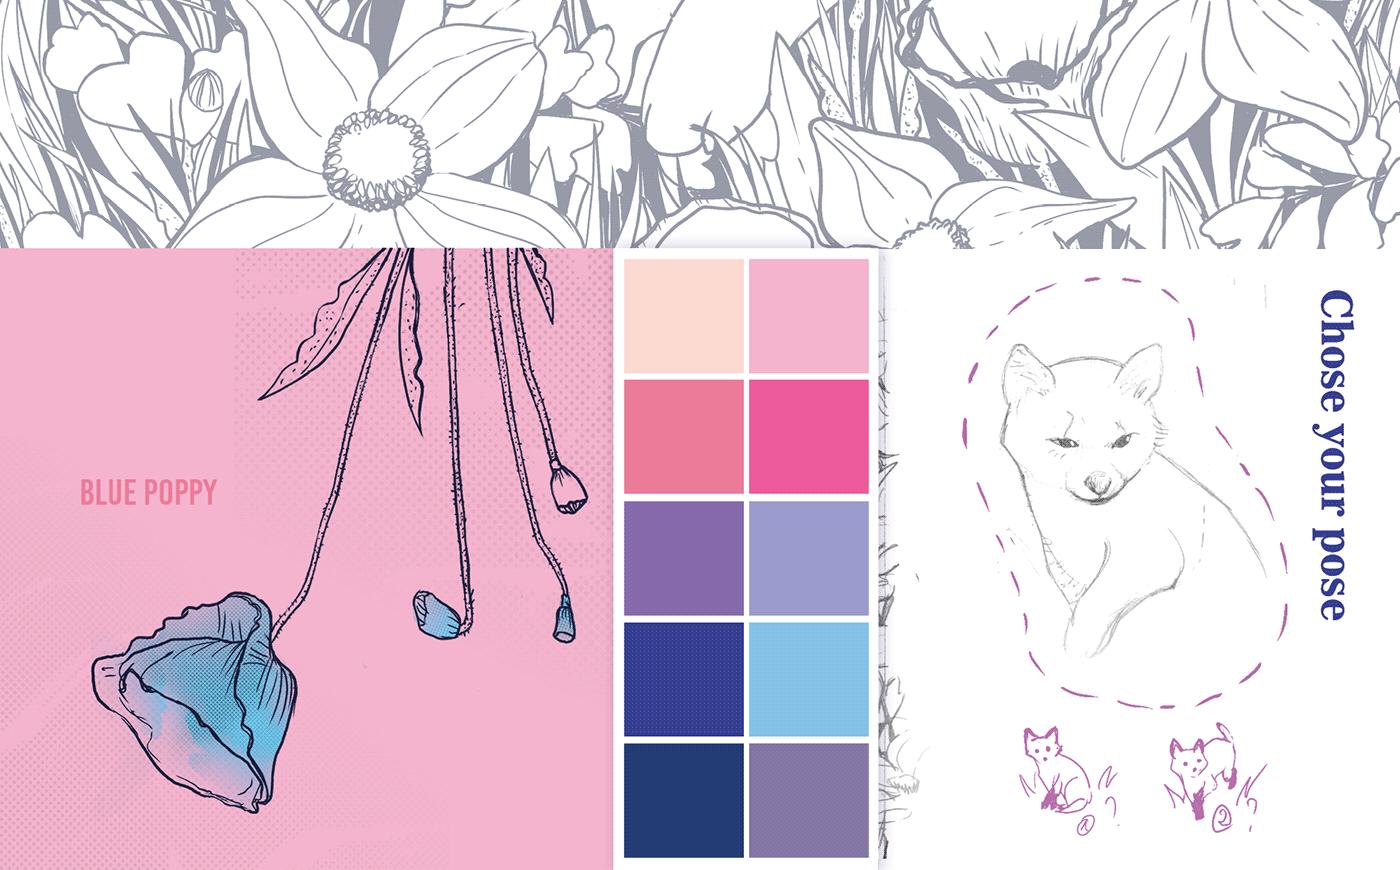 animation  creation development digital painting Flowers FOX hand drawing ILLUSTRATION